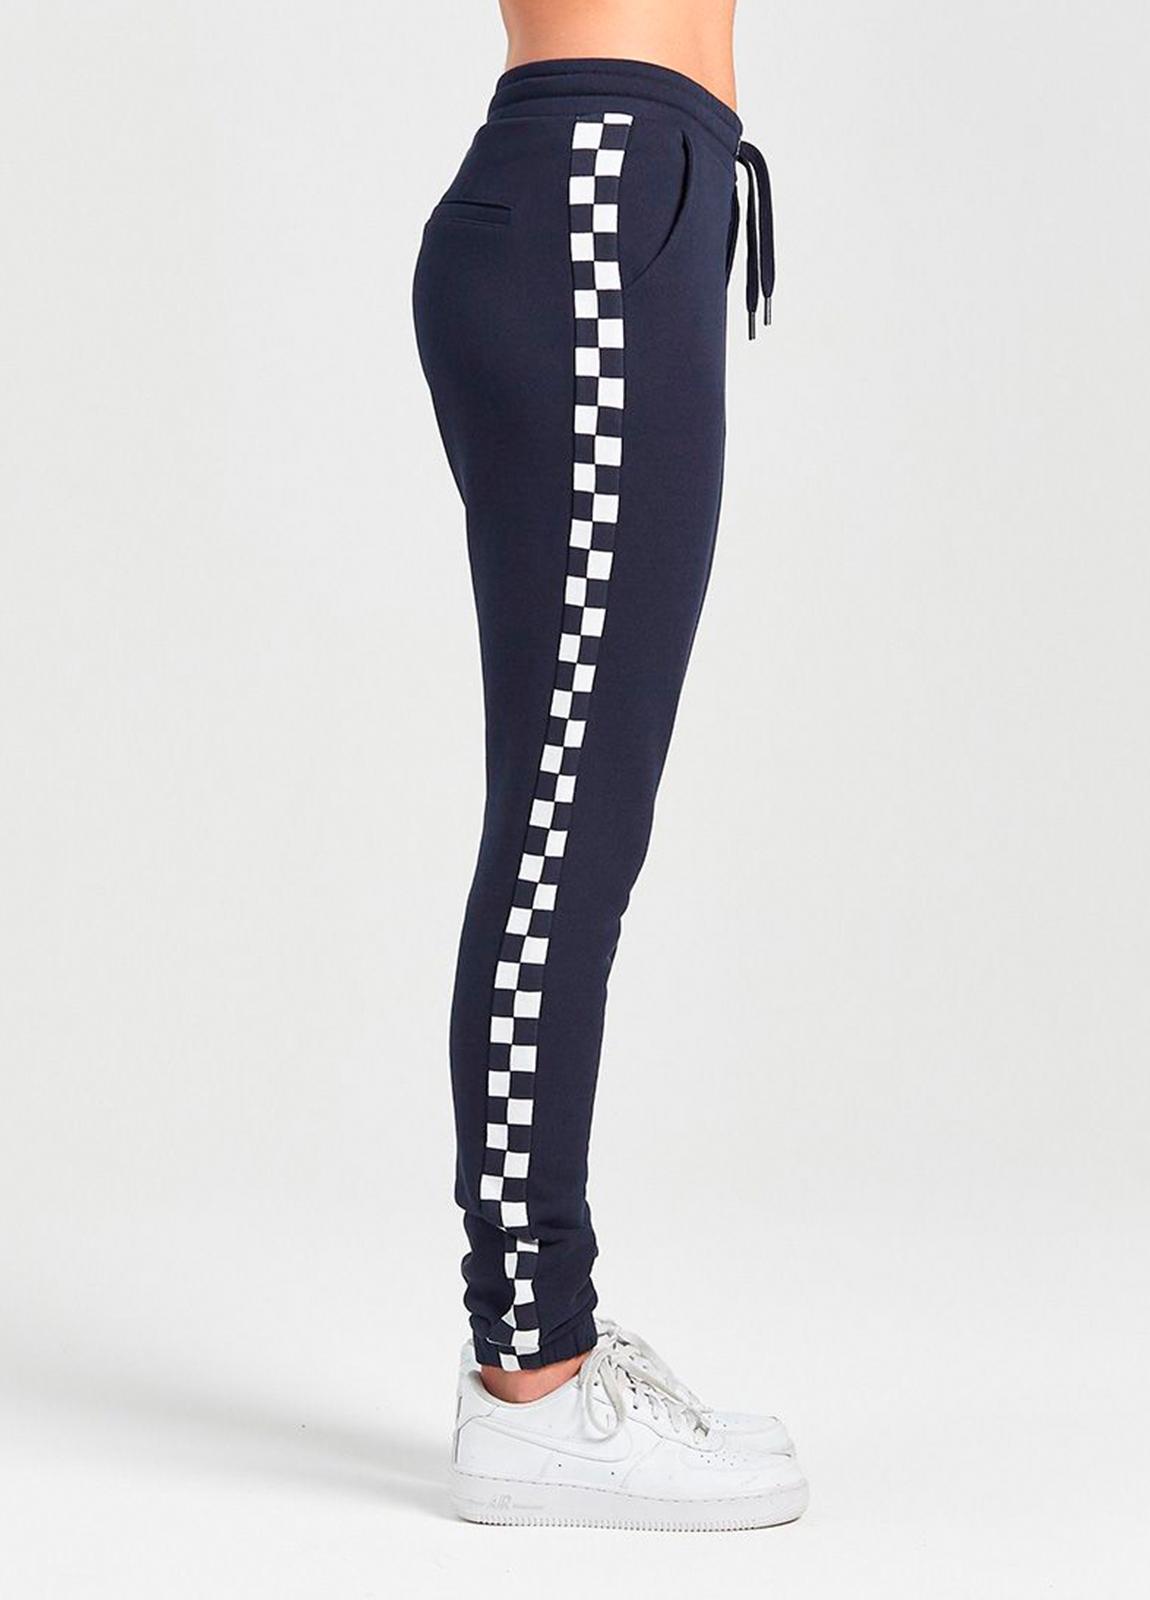 Pantalón jogging relaxed fit color negro con dibujo lateral geométrico. 80% Algodón 20% Poliéster.